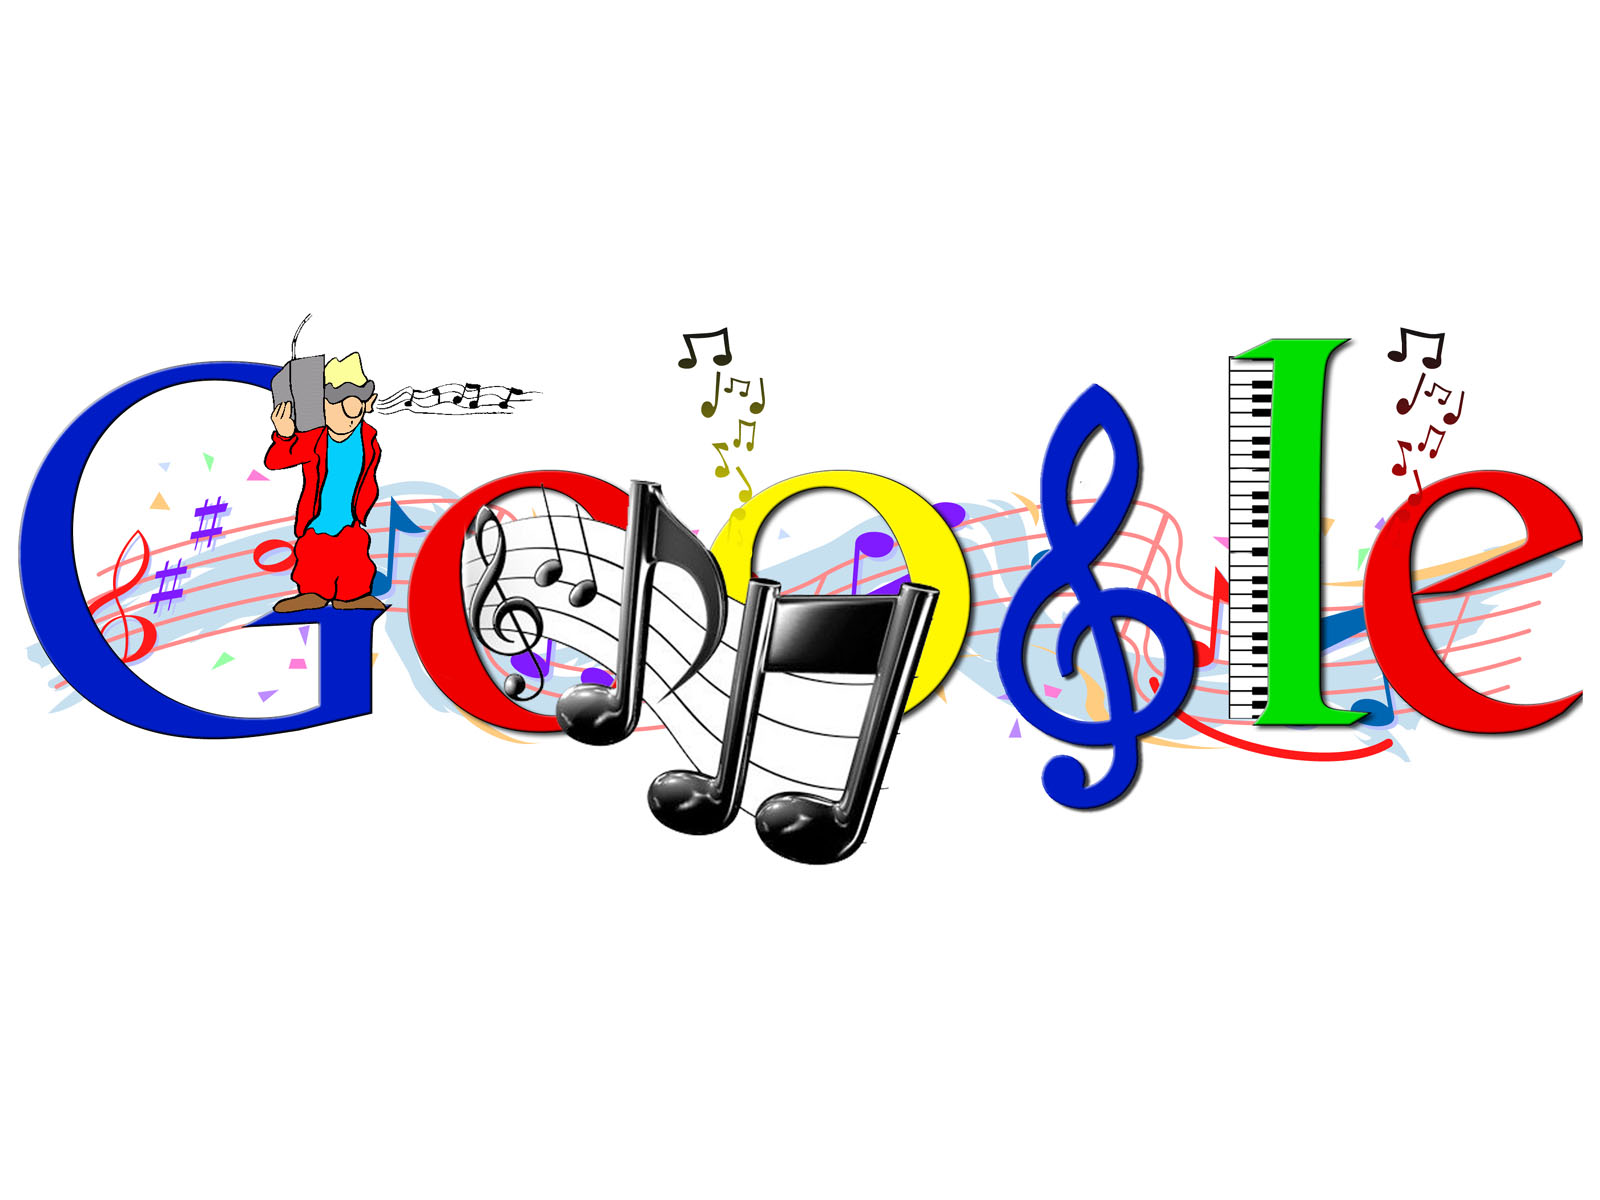 wallpaper free google wallpapers